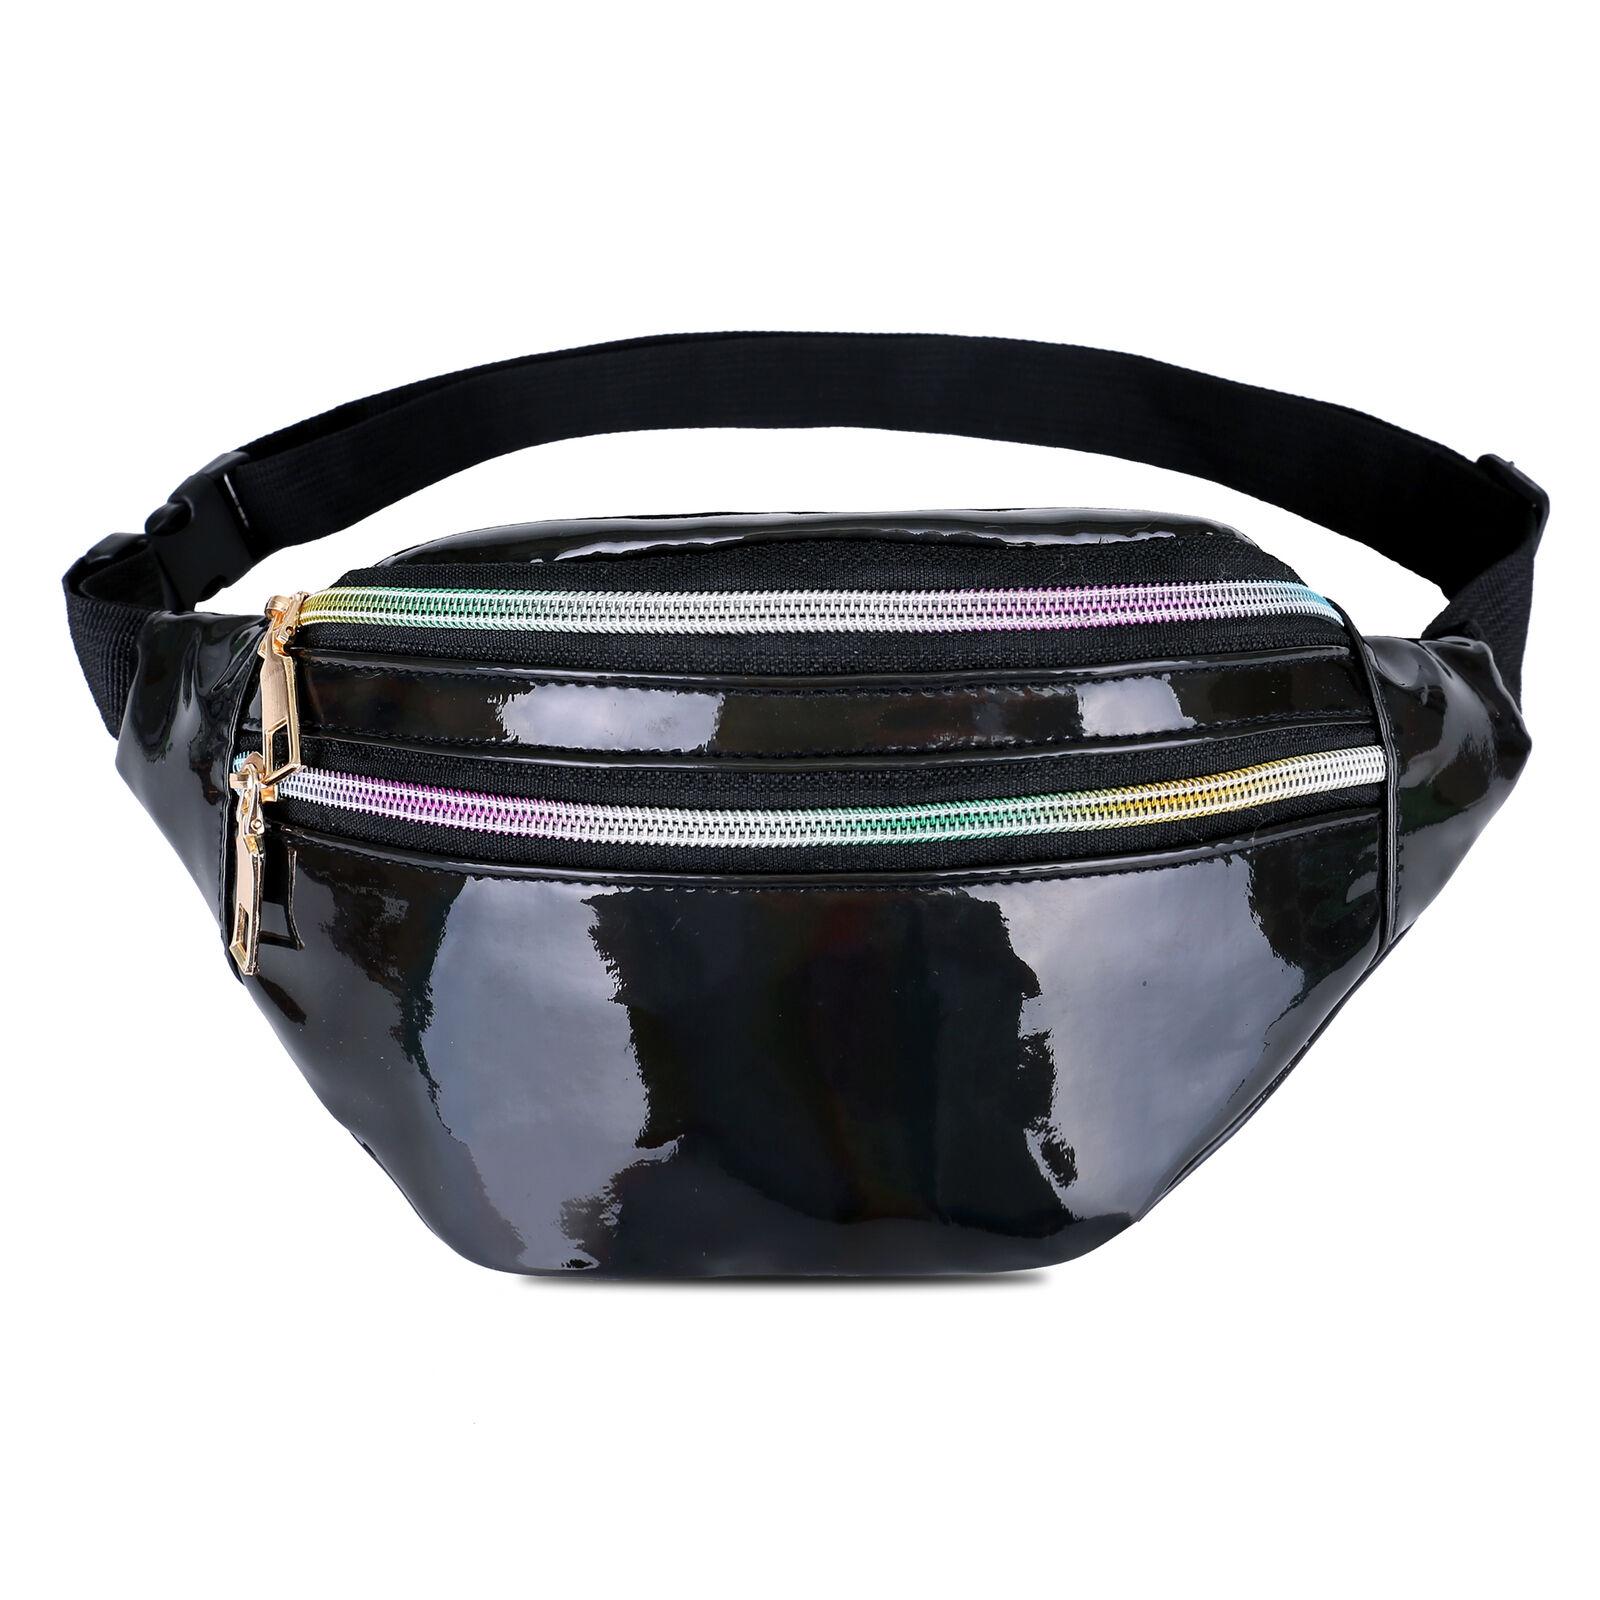 Fashion Hip Hop Waist Bag 2019 Women's Fanny Pack Portable Holographic Bright Color Travel Purse Chest Bag